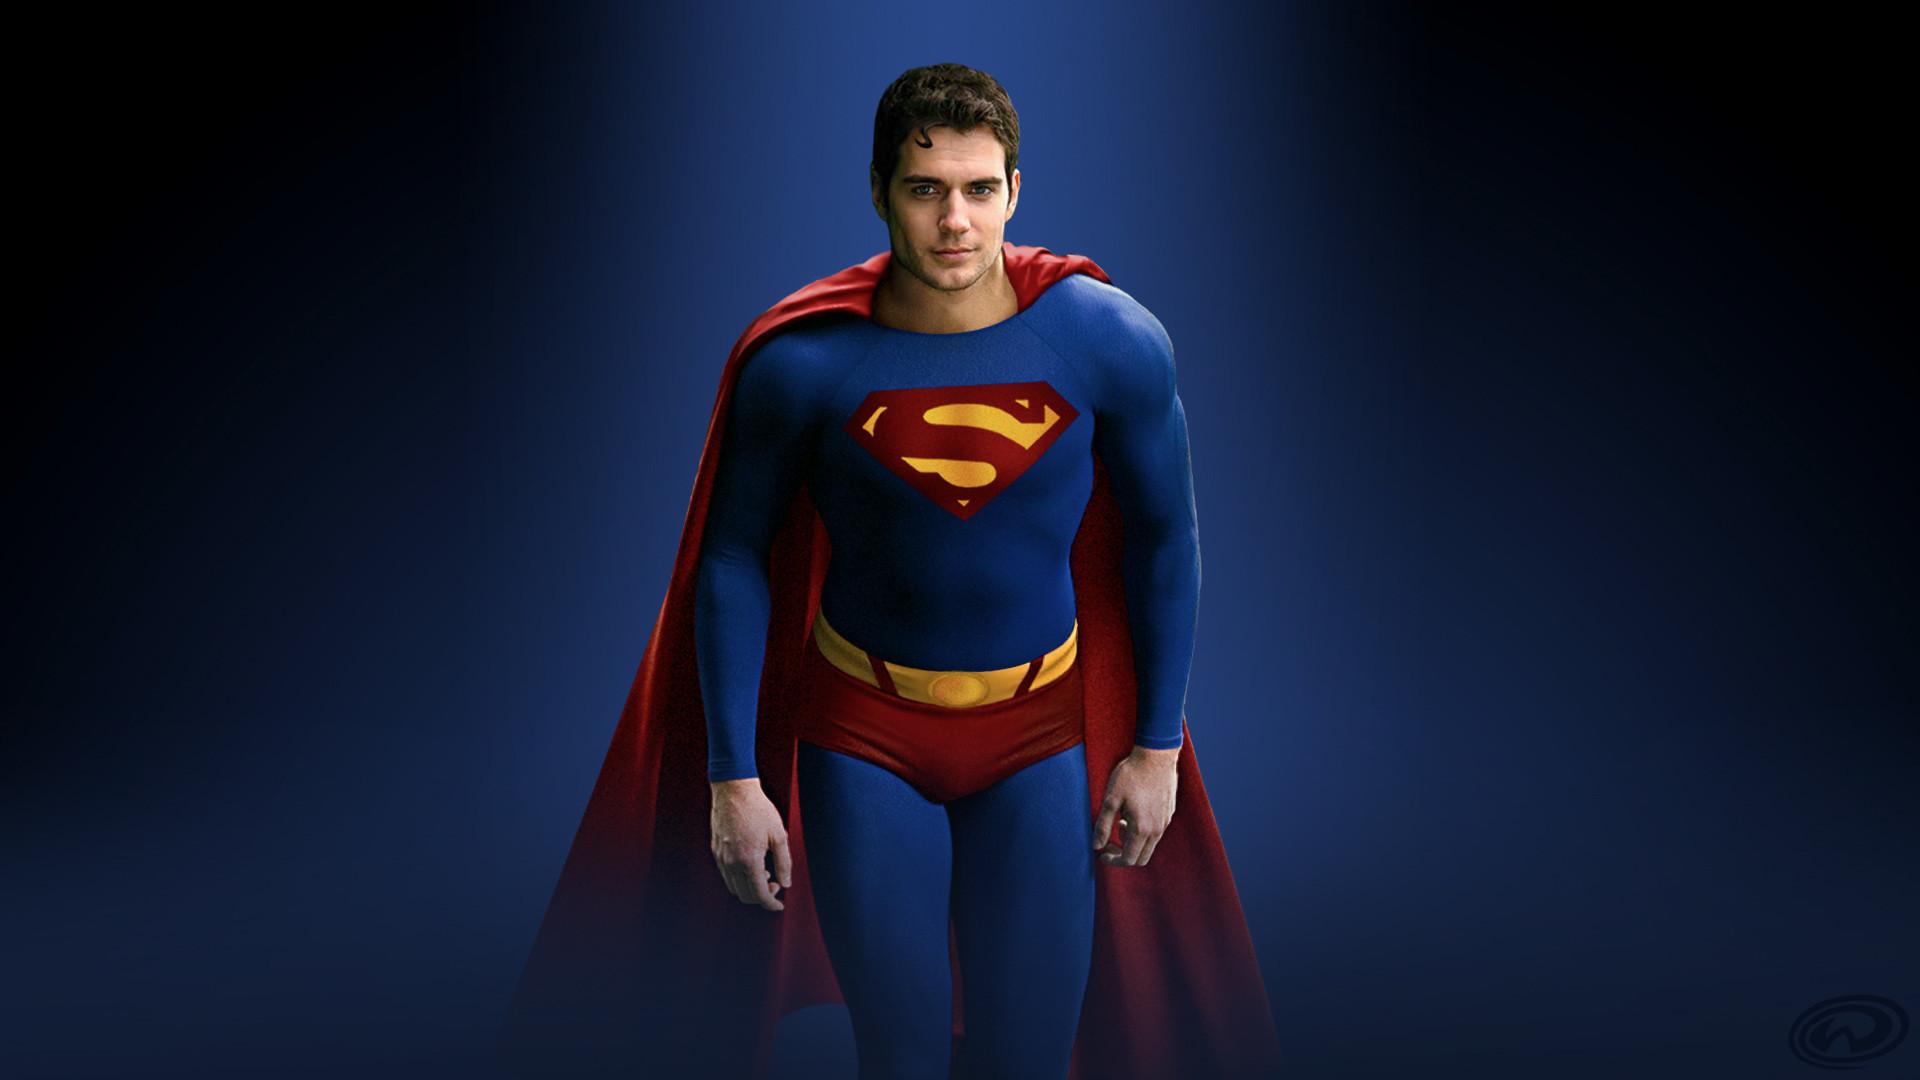 Res: 1920x1080, ... 3d Superman Wallpapers Backgrounds Bilder 93276 ...